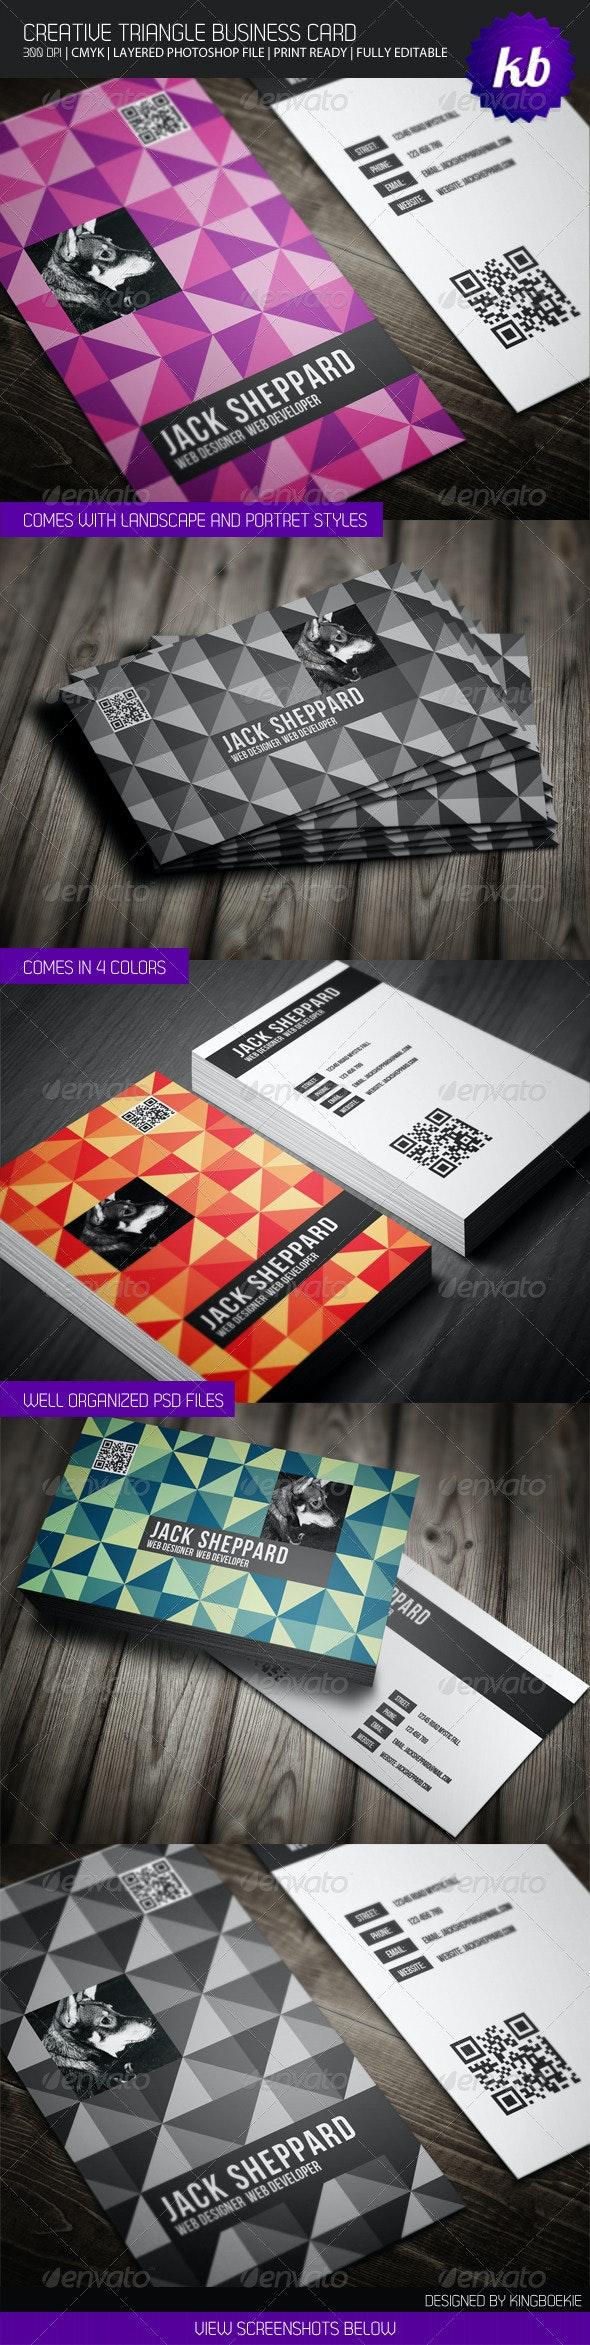 Creative Triangle Business Card - Creative Business Cards